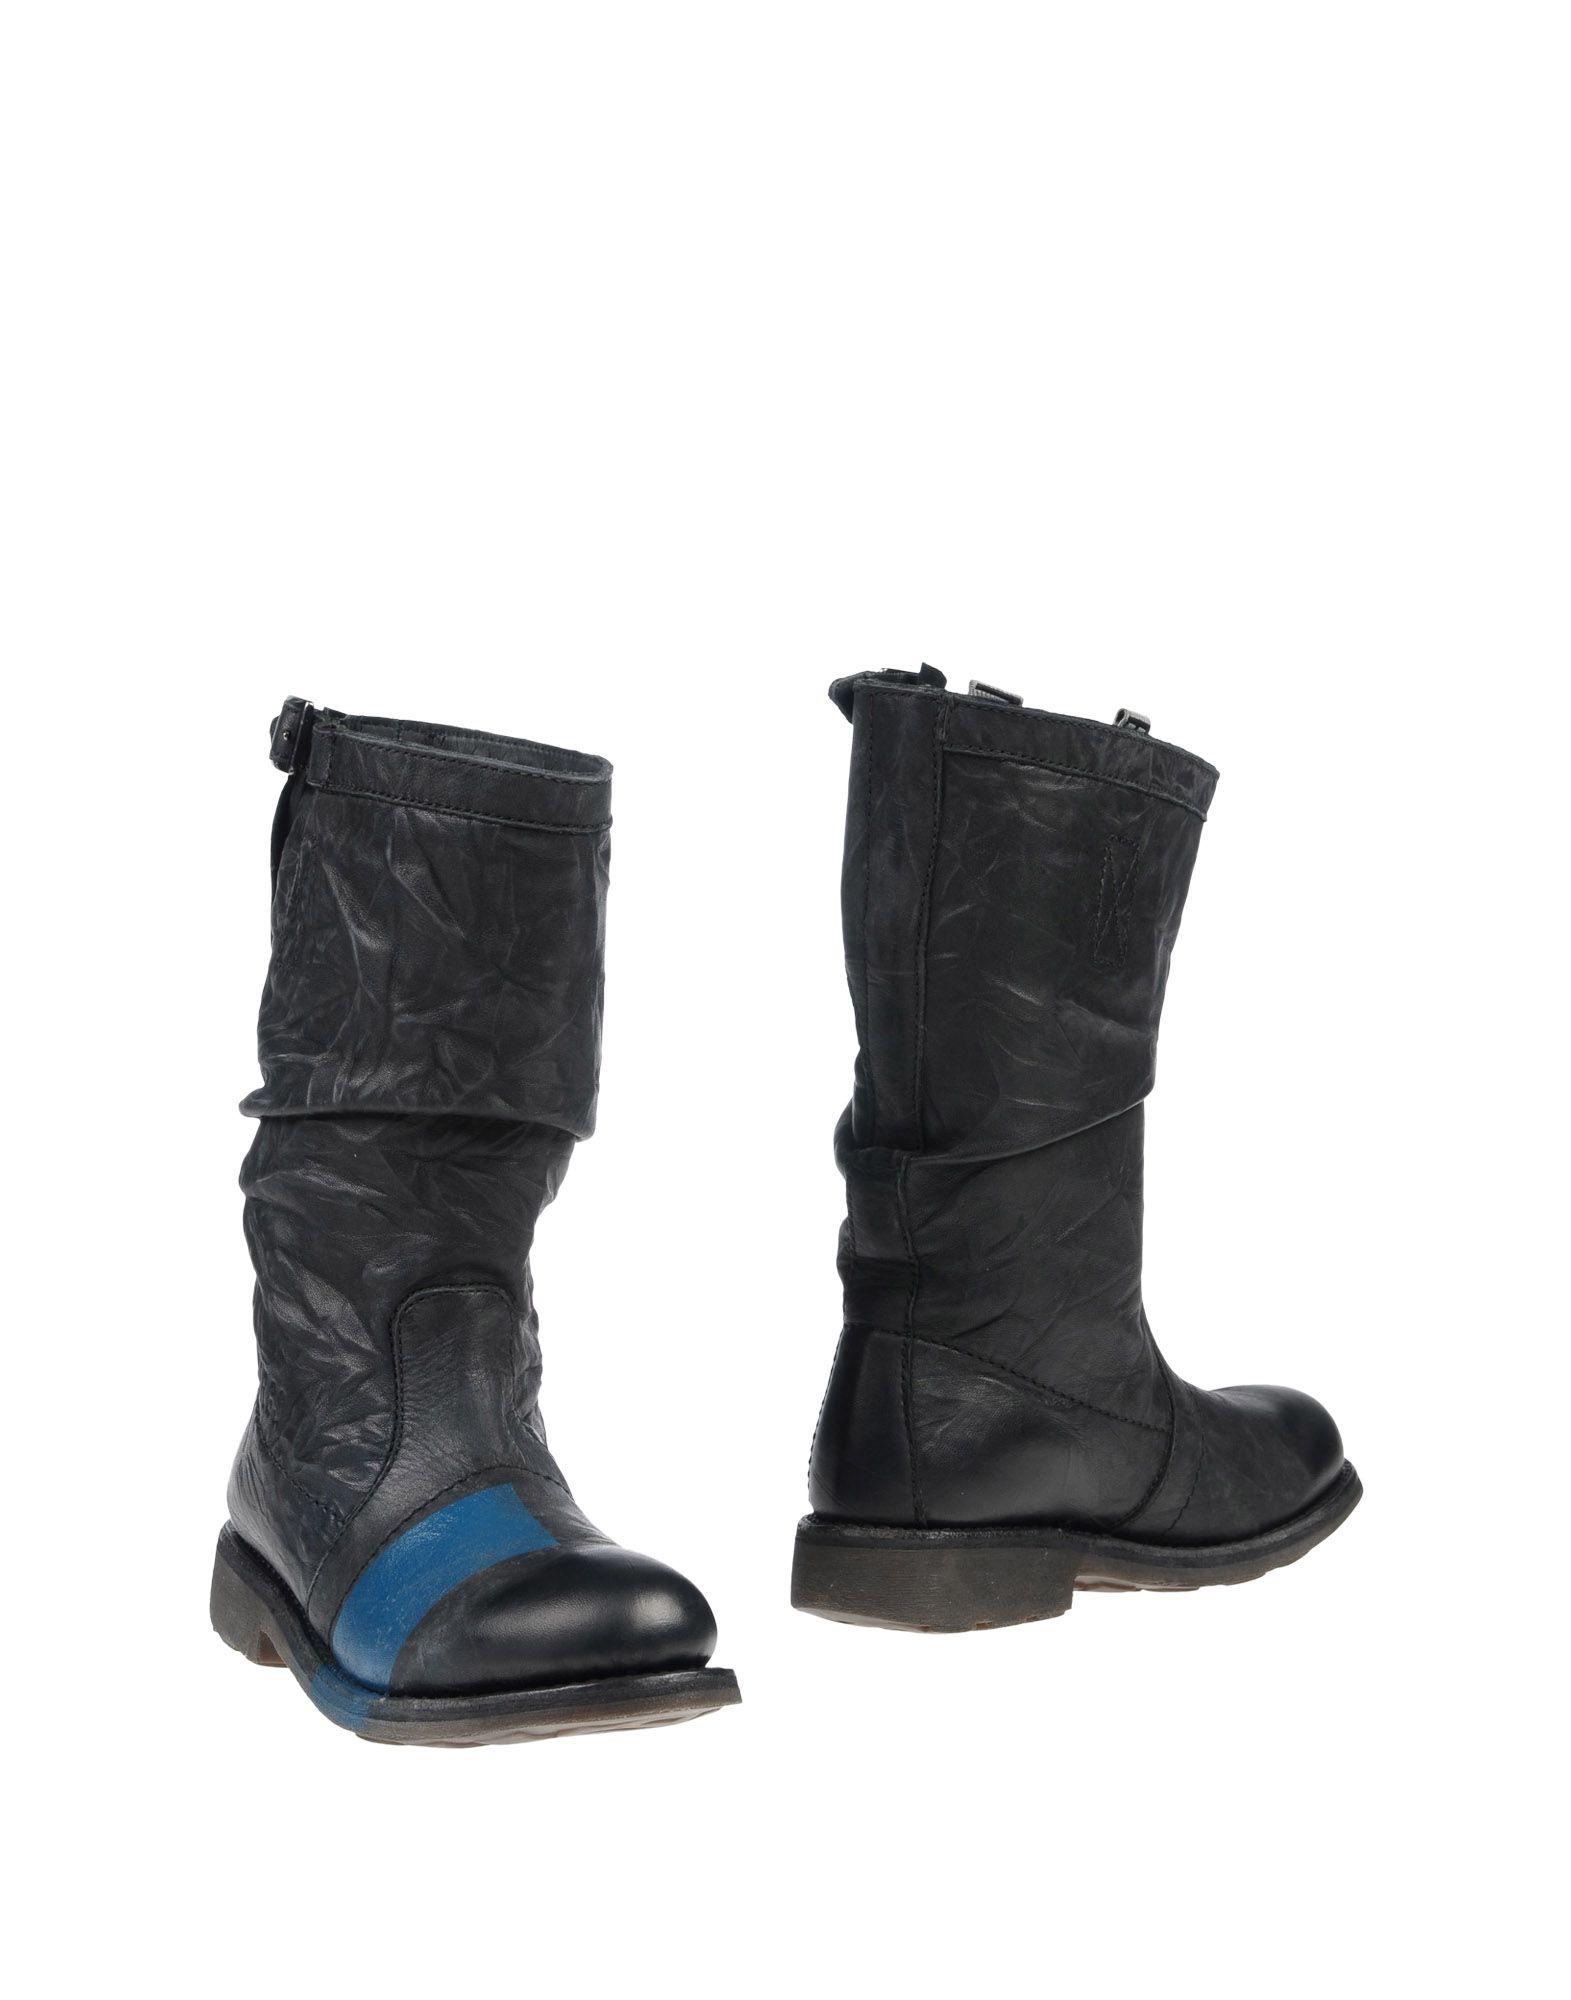 Bikkembergs Stiefel Damen Schuhe  11417878OEGut aussehende strapazierfähige Schuhe Damen 3a92df